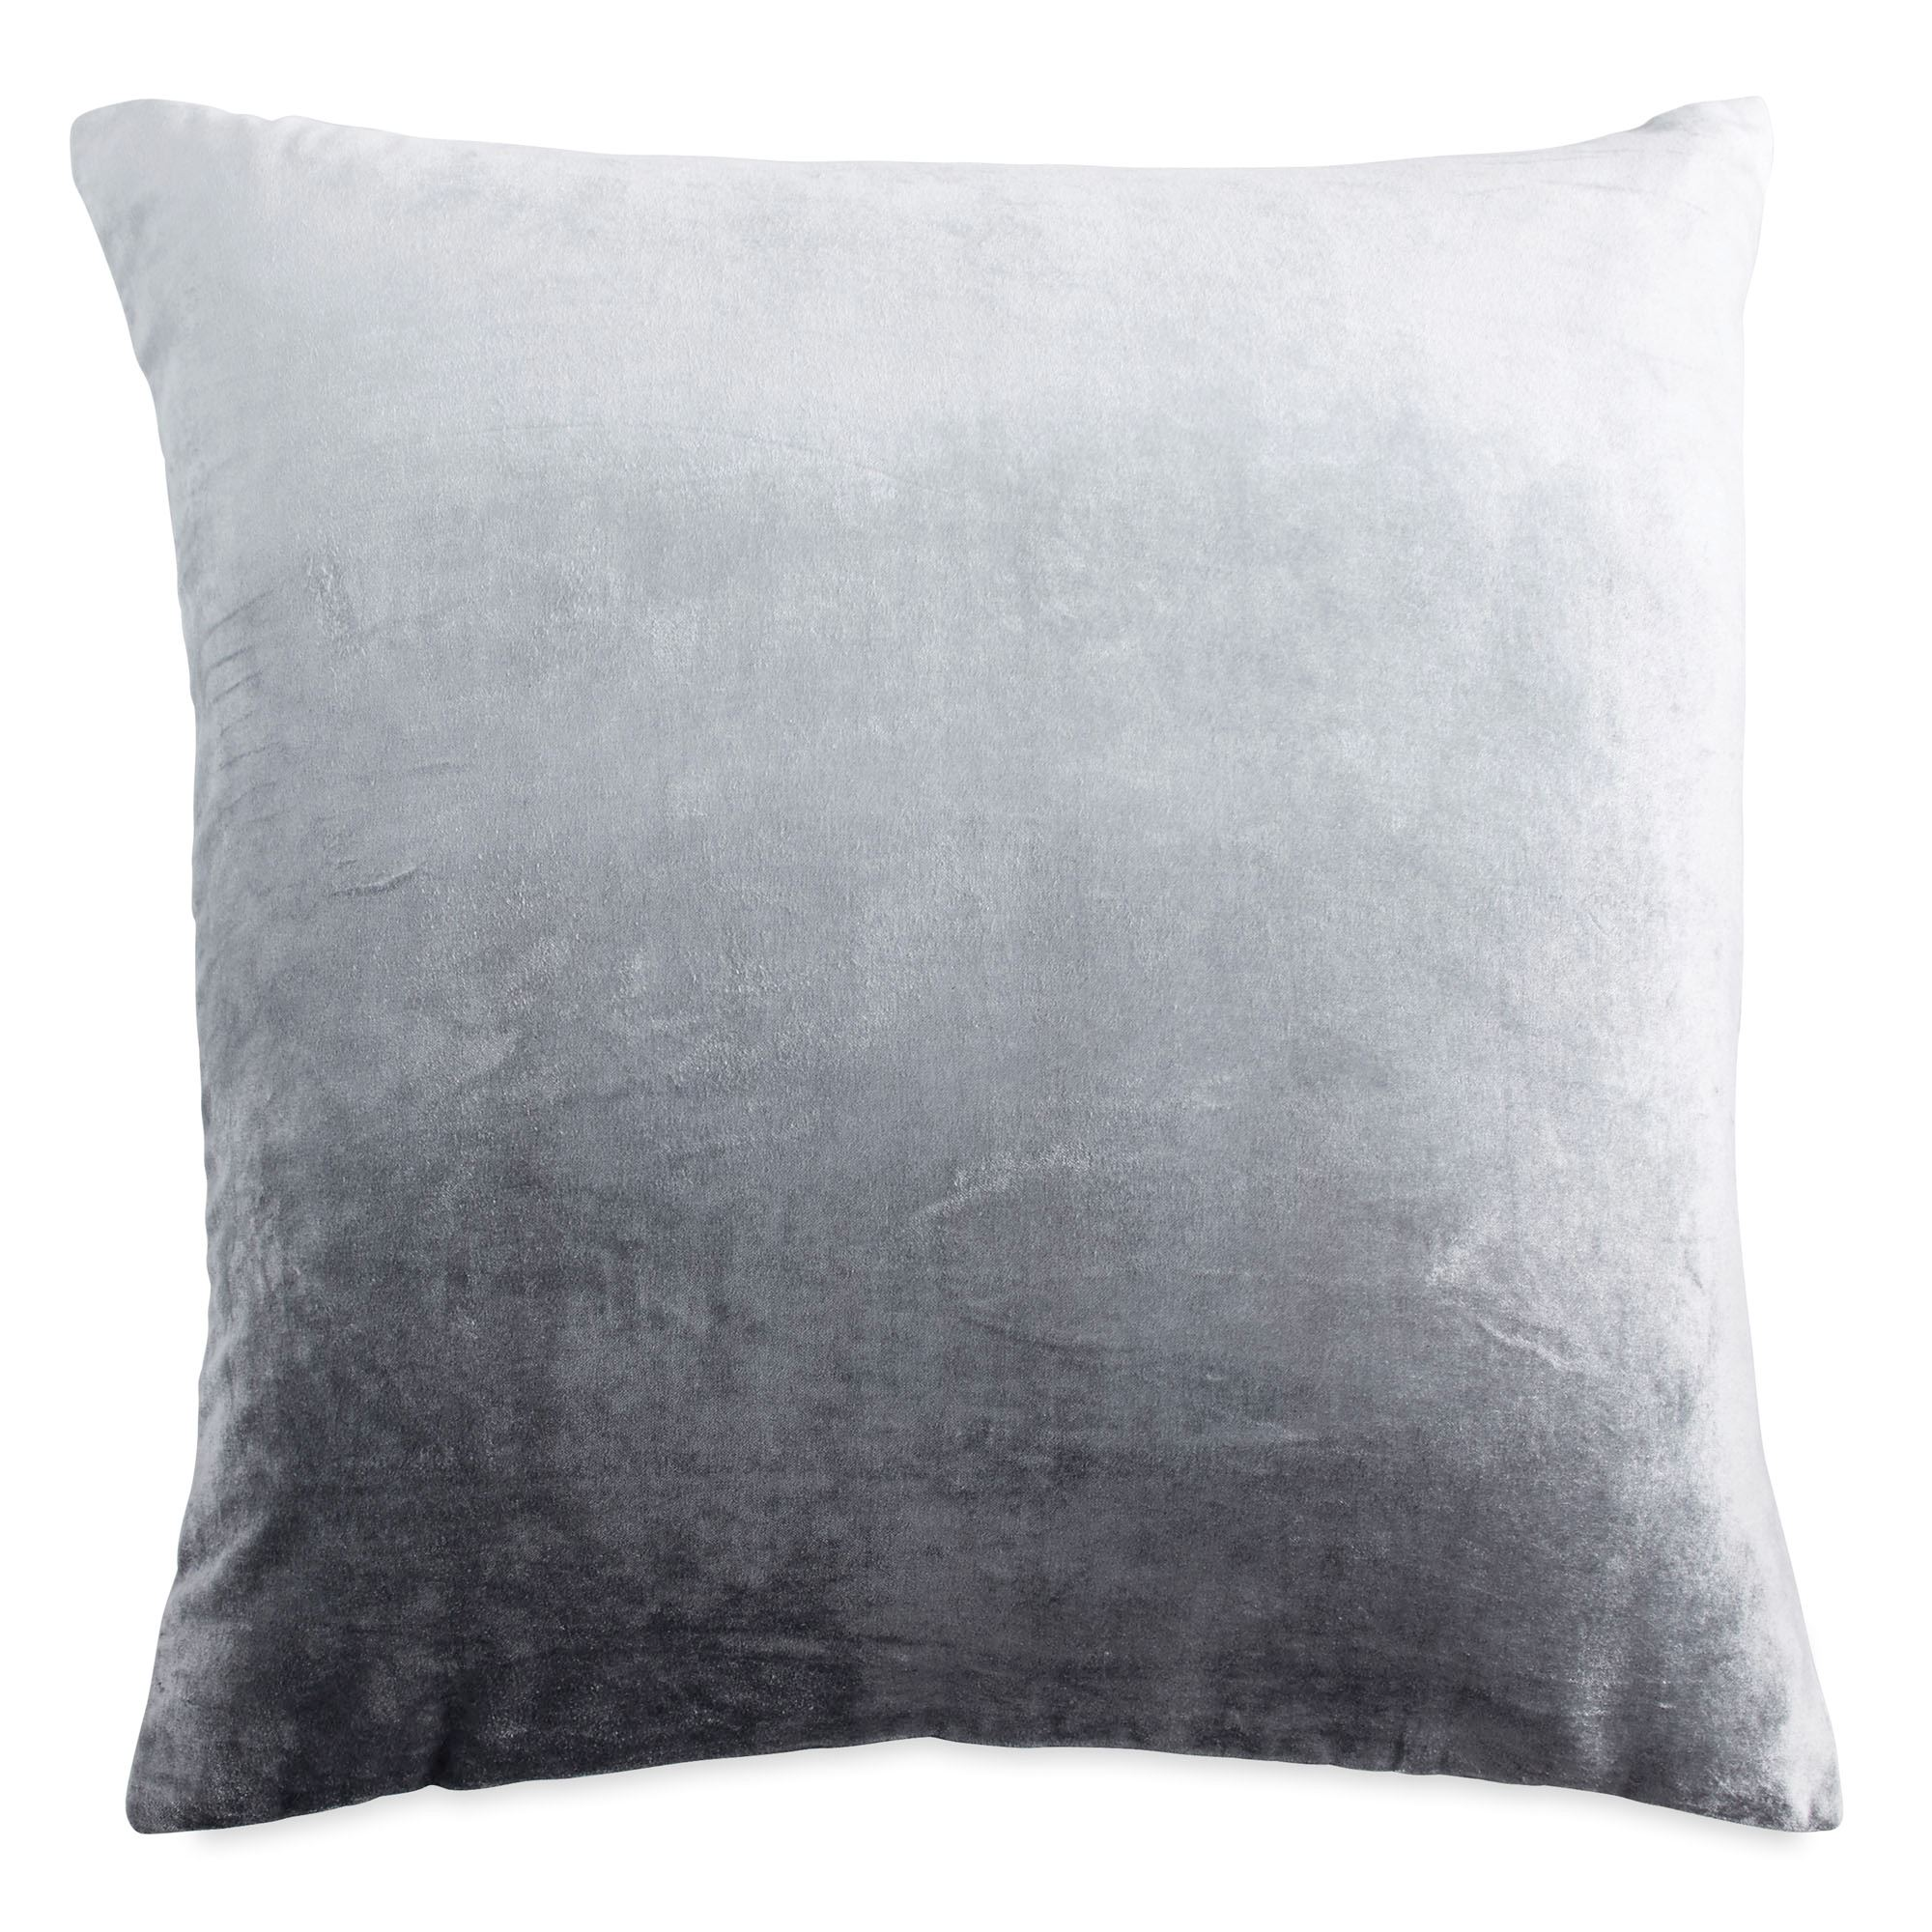 Cut Geo Mini Comforter Set from Peri Home